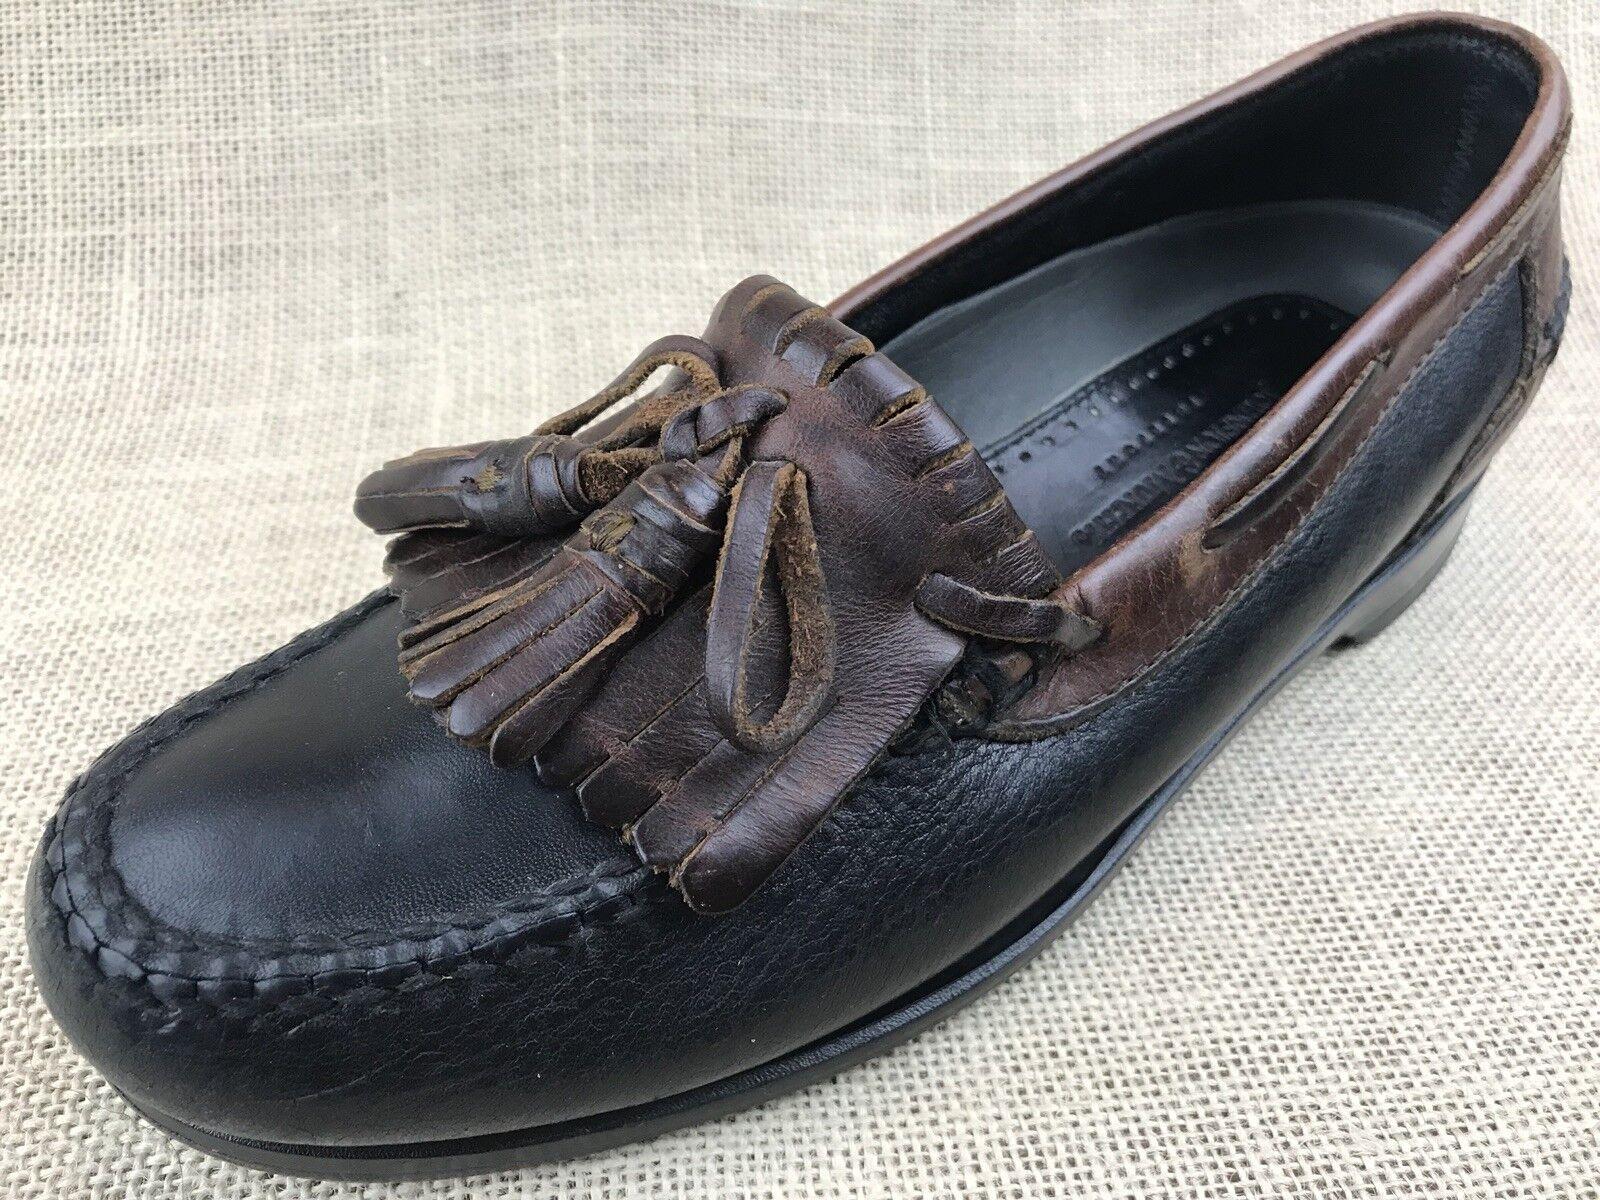 Men's JOHNSTON & MURPHY Loafer Leather 7.5 Tassels Kiltie Slip Black 7.5 Leather M 62eed3